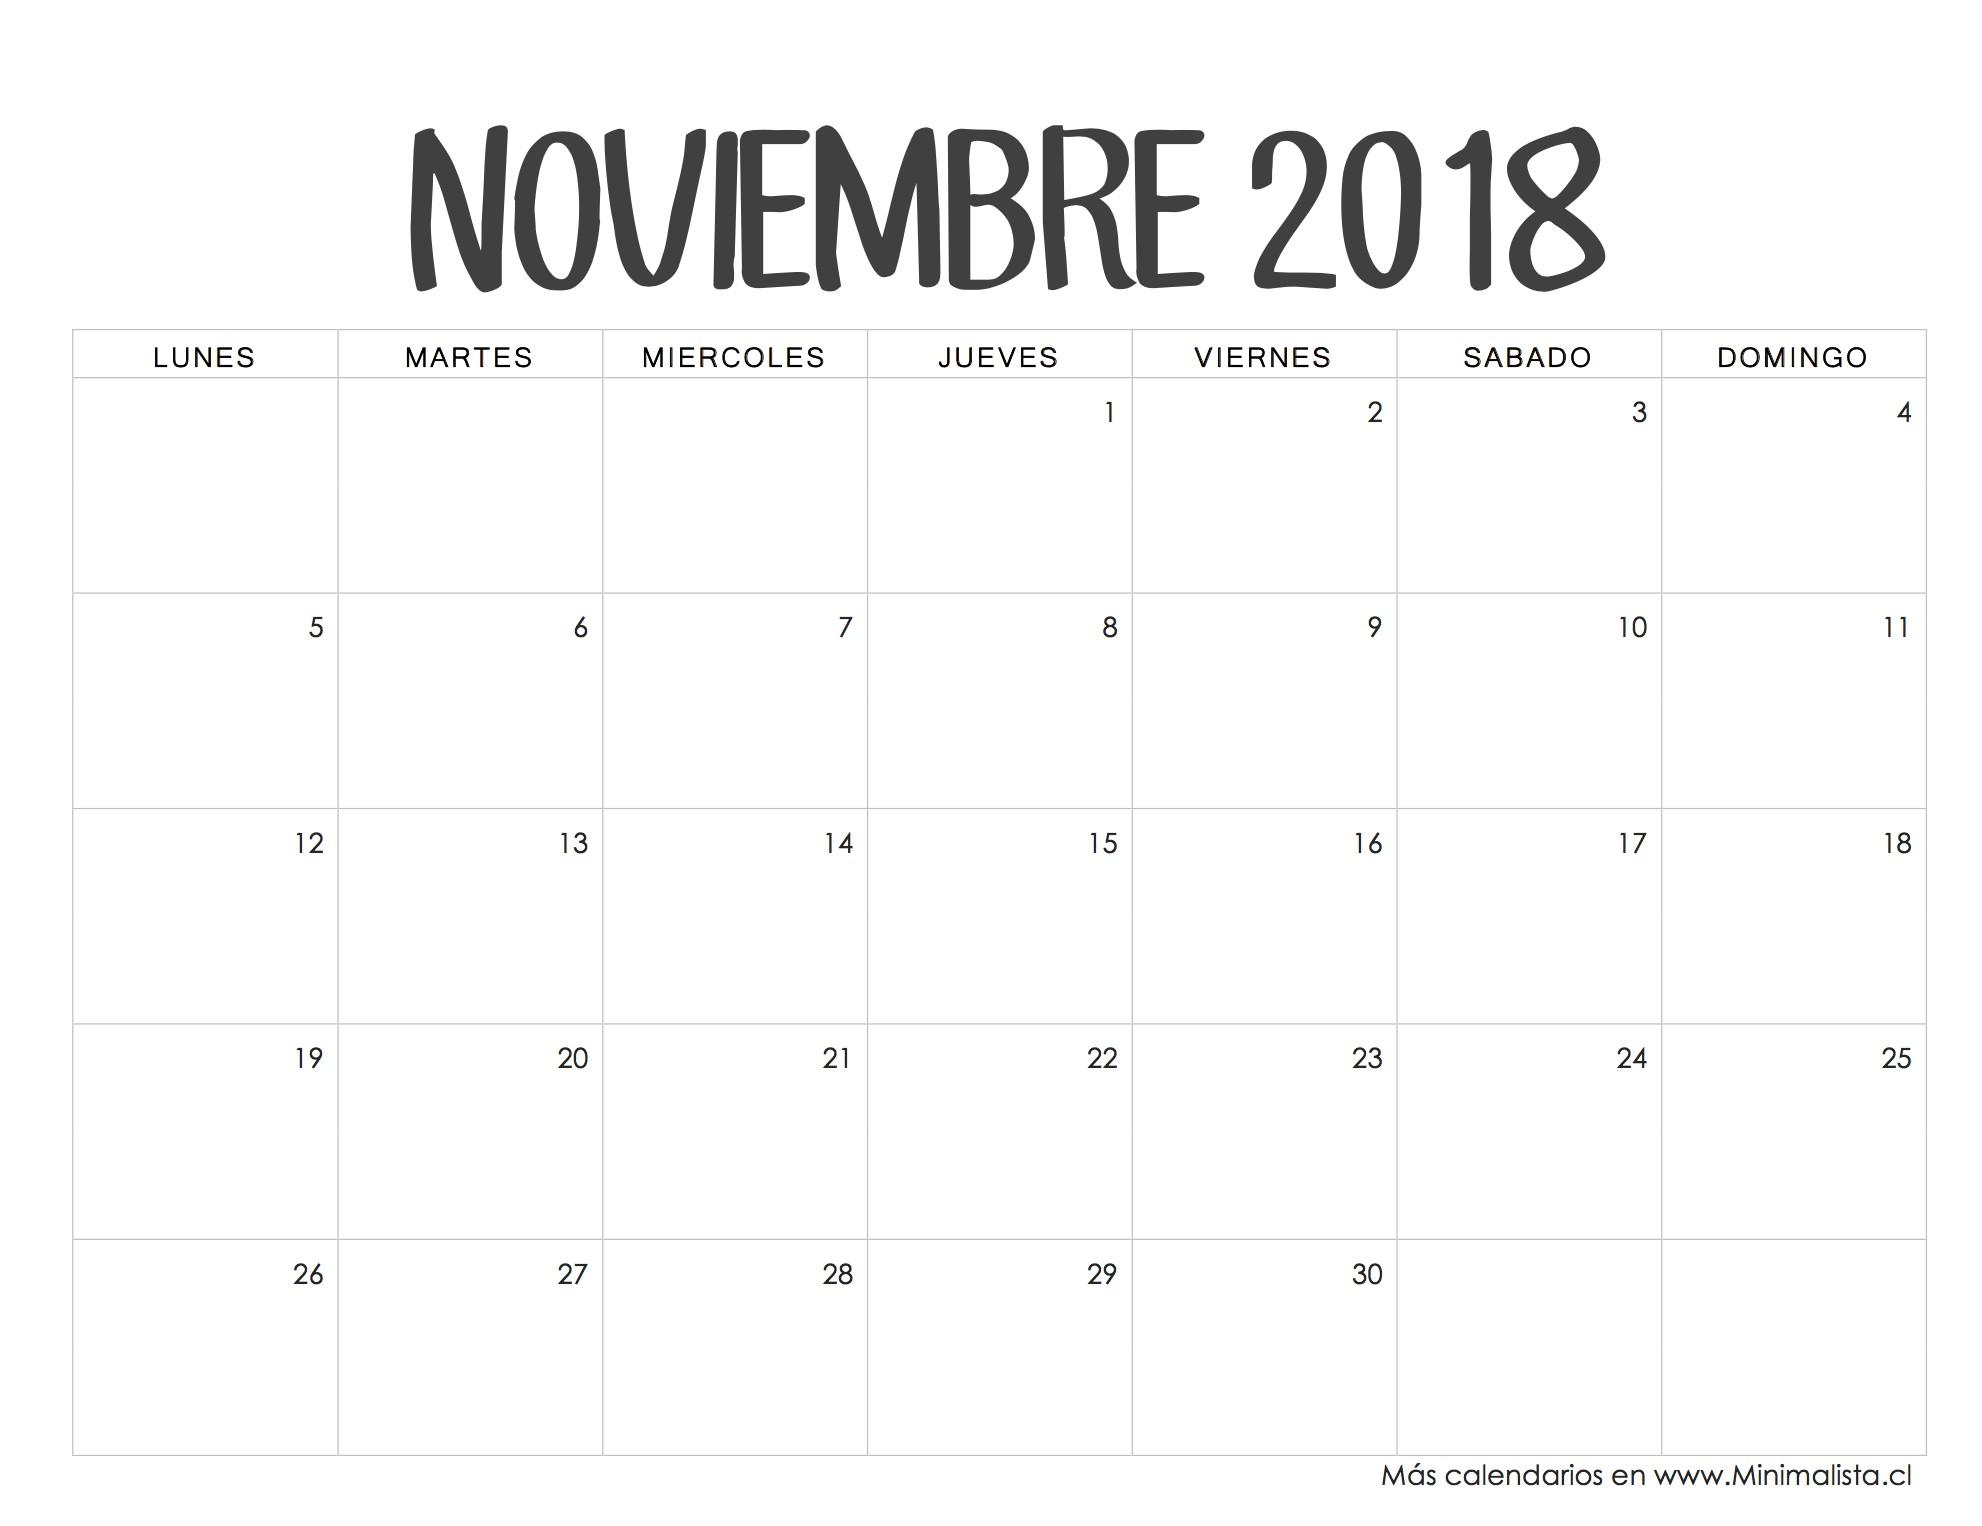 Calendario Mensual 2017 Para Imprimir Con Feriados Más Arriba-a-fecha Calendario Noviembre 2018 Printables Pinterest Of Calendario Mensual 2017 Para Imprimir Con Feriados Más Recientes Best Calendario Enero 2017 Para Imprimir Pdf Image Collection